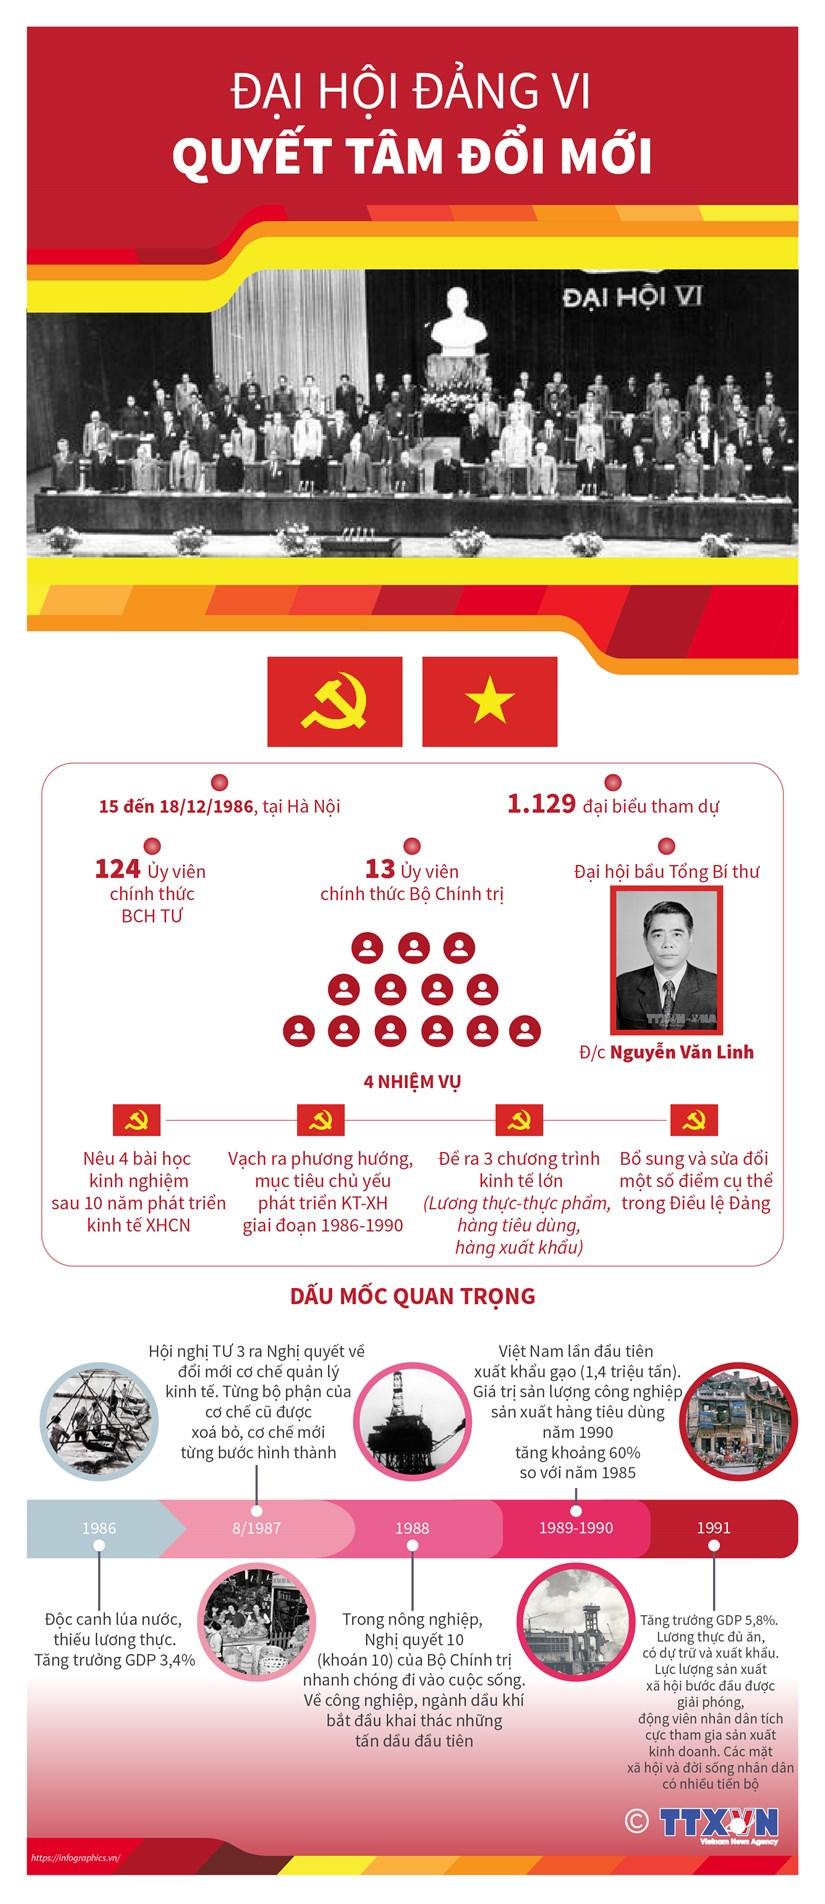 [Infographics] Dai hoi Dang lan thu VI: Quyet tam doi moi hinh anh 1